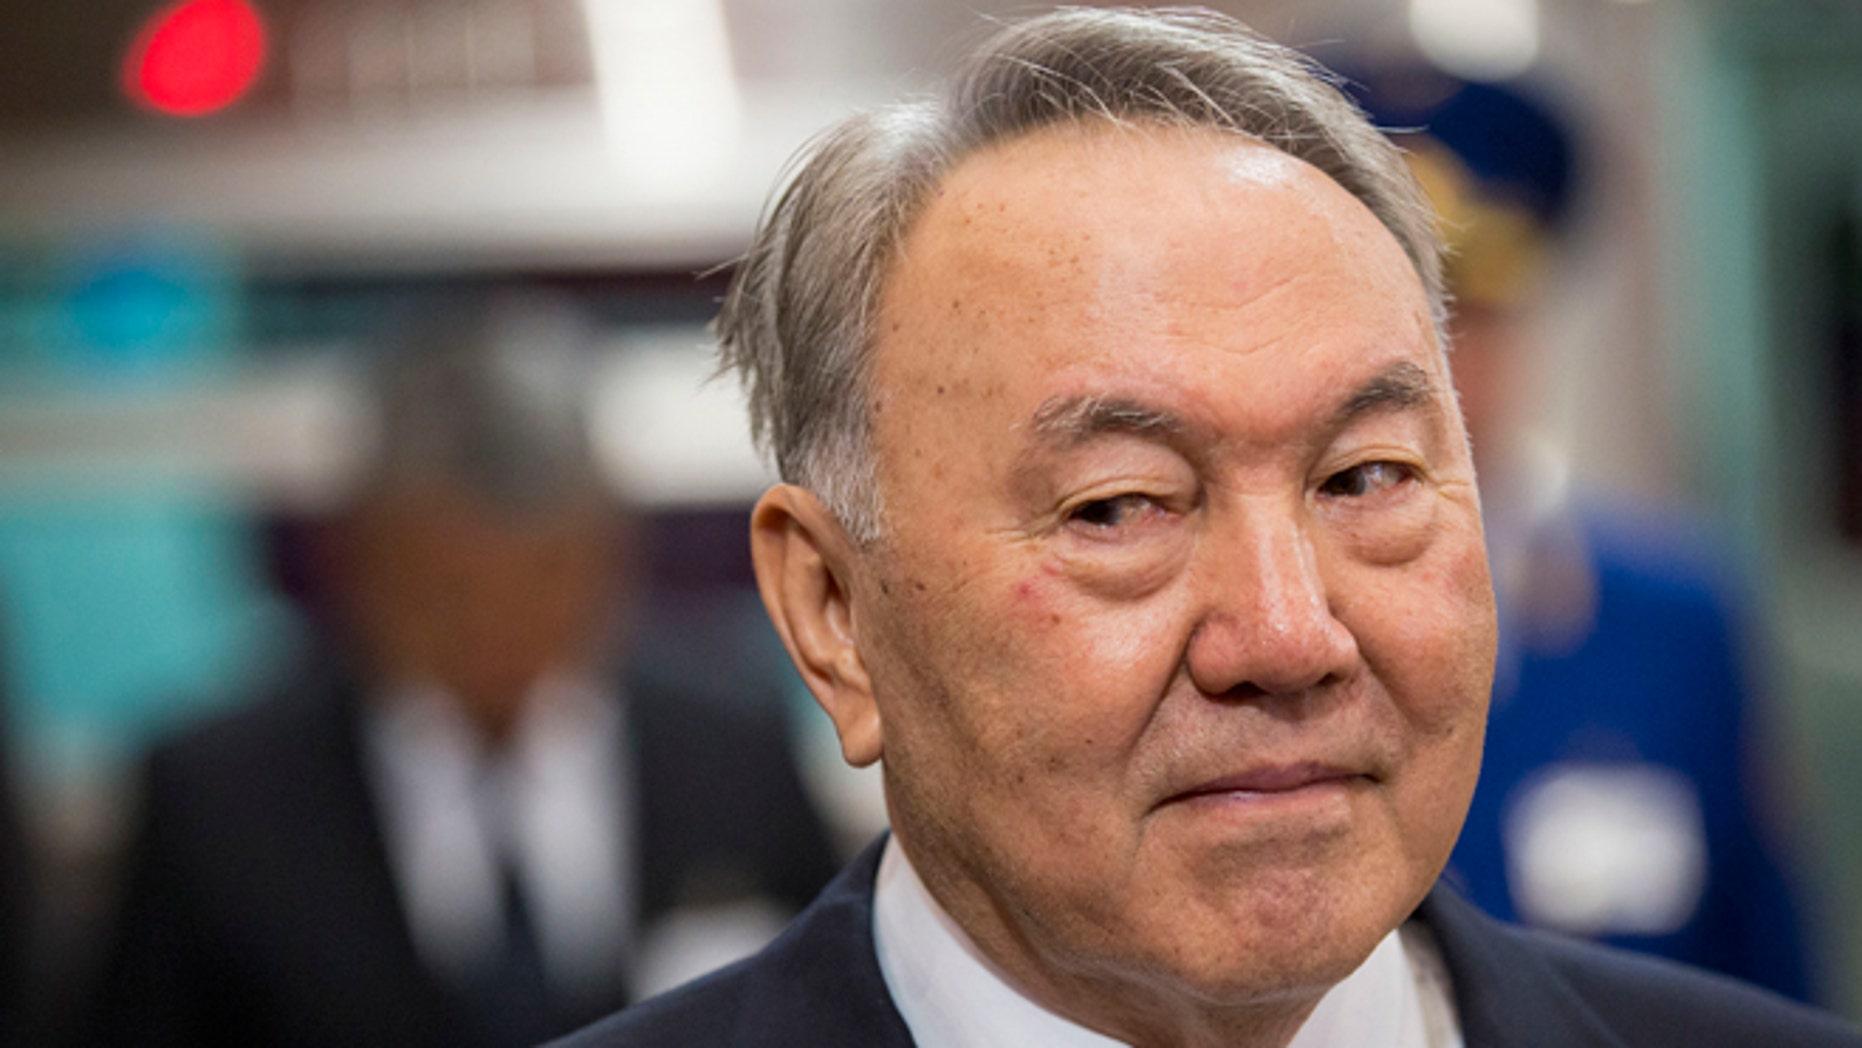 April 18, 2015: Kazakhstan President Nursultan Nazarbayev is seen in Almaty, Kazakhstan.